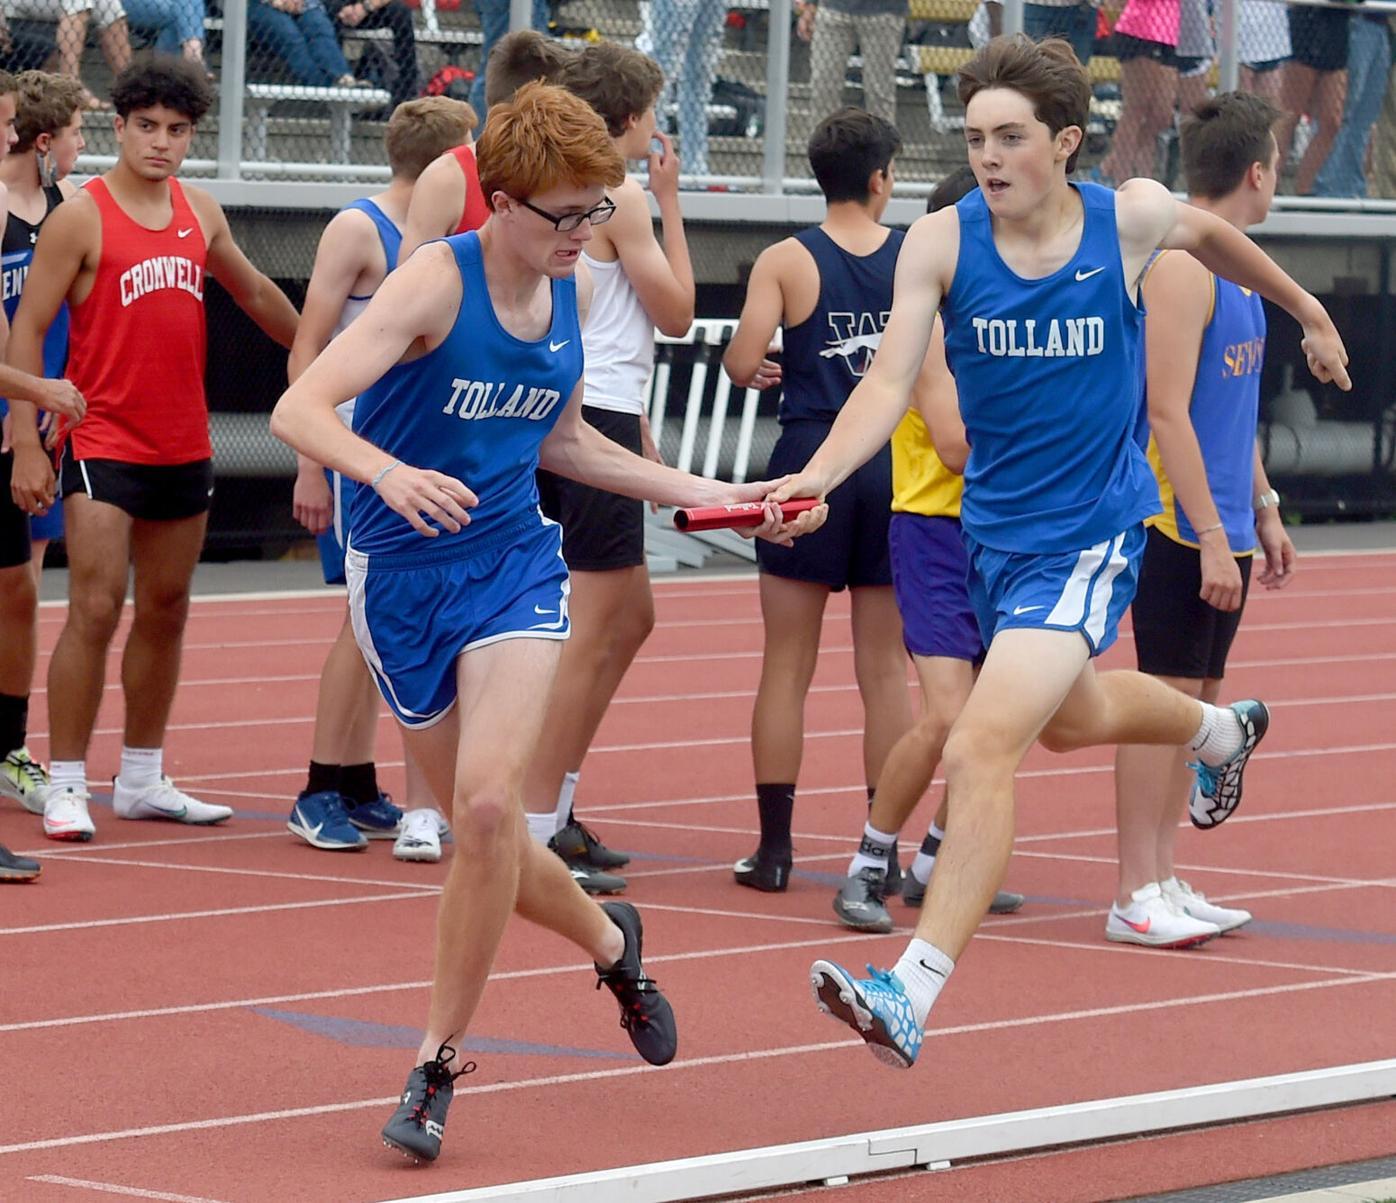 060221 Track Meet 01.jpg